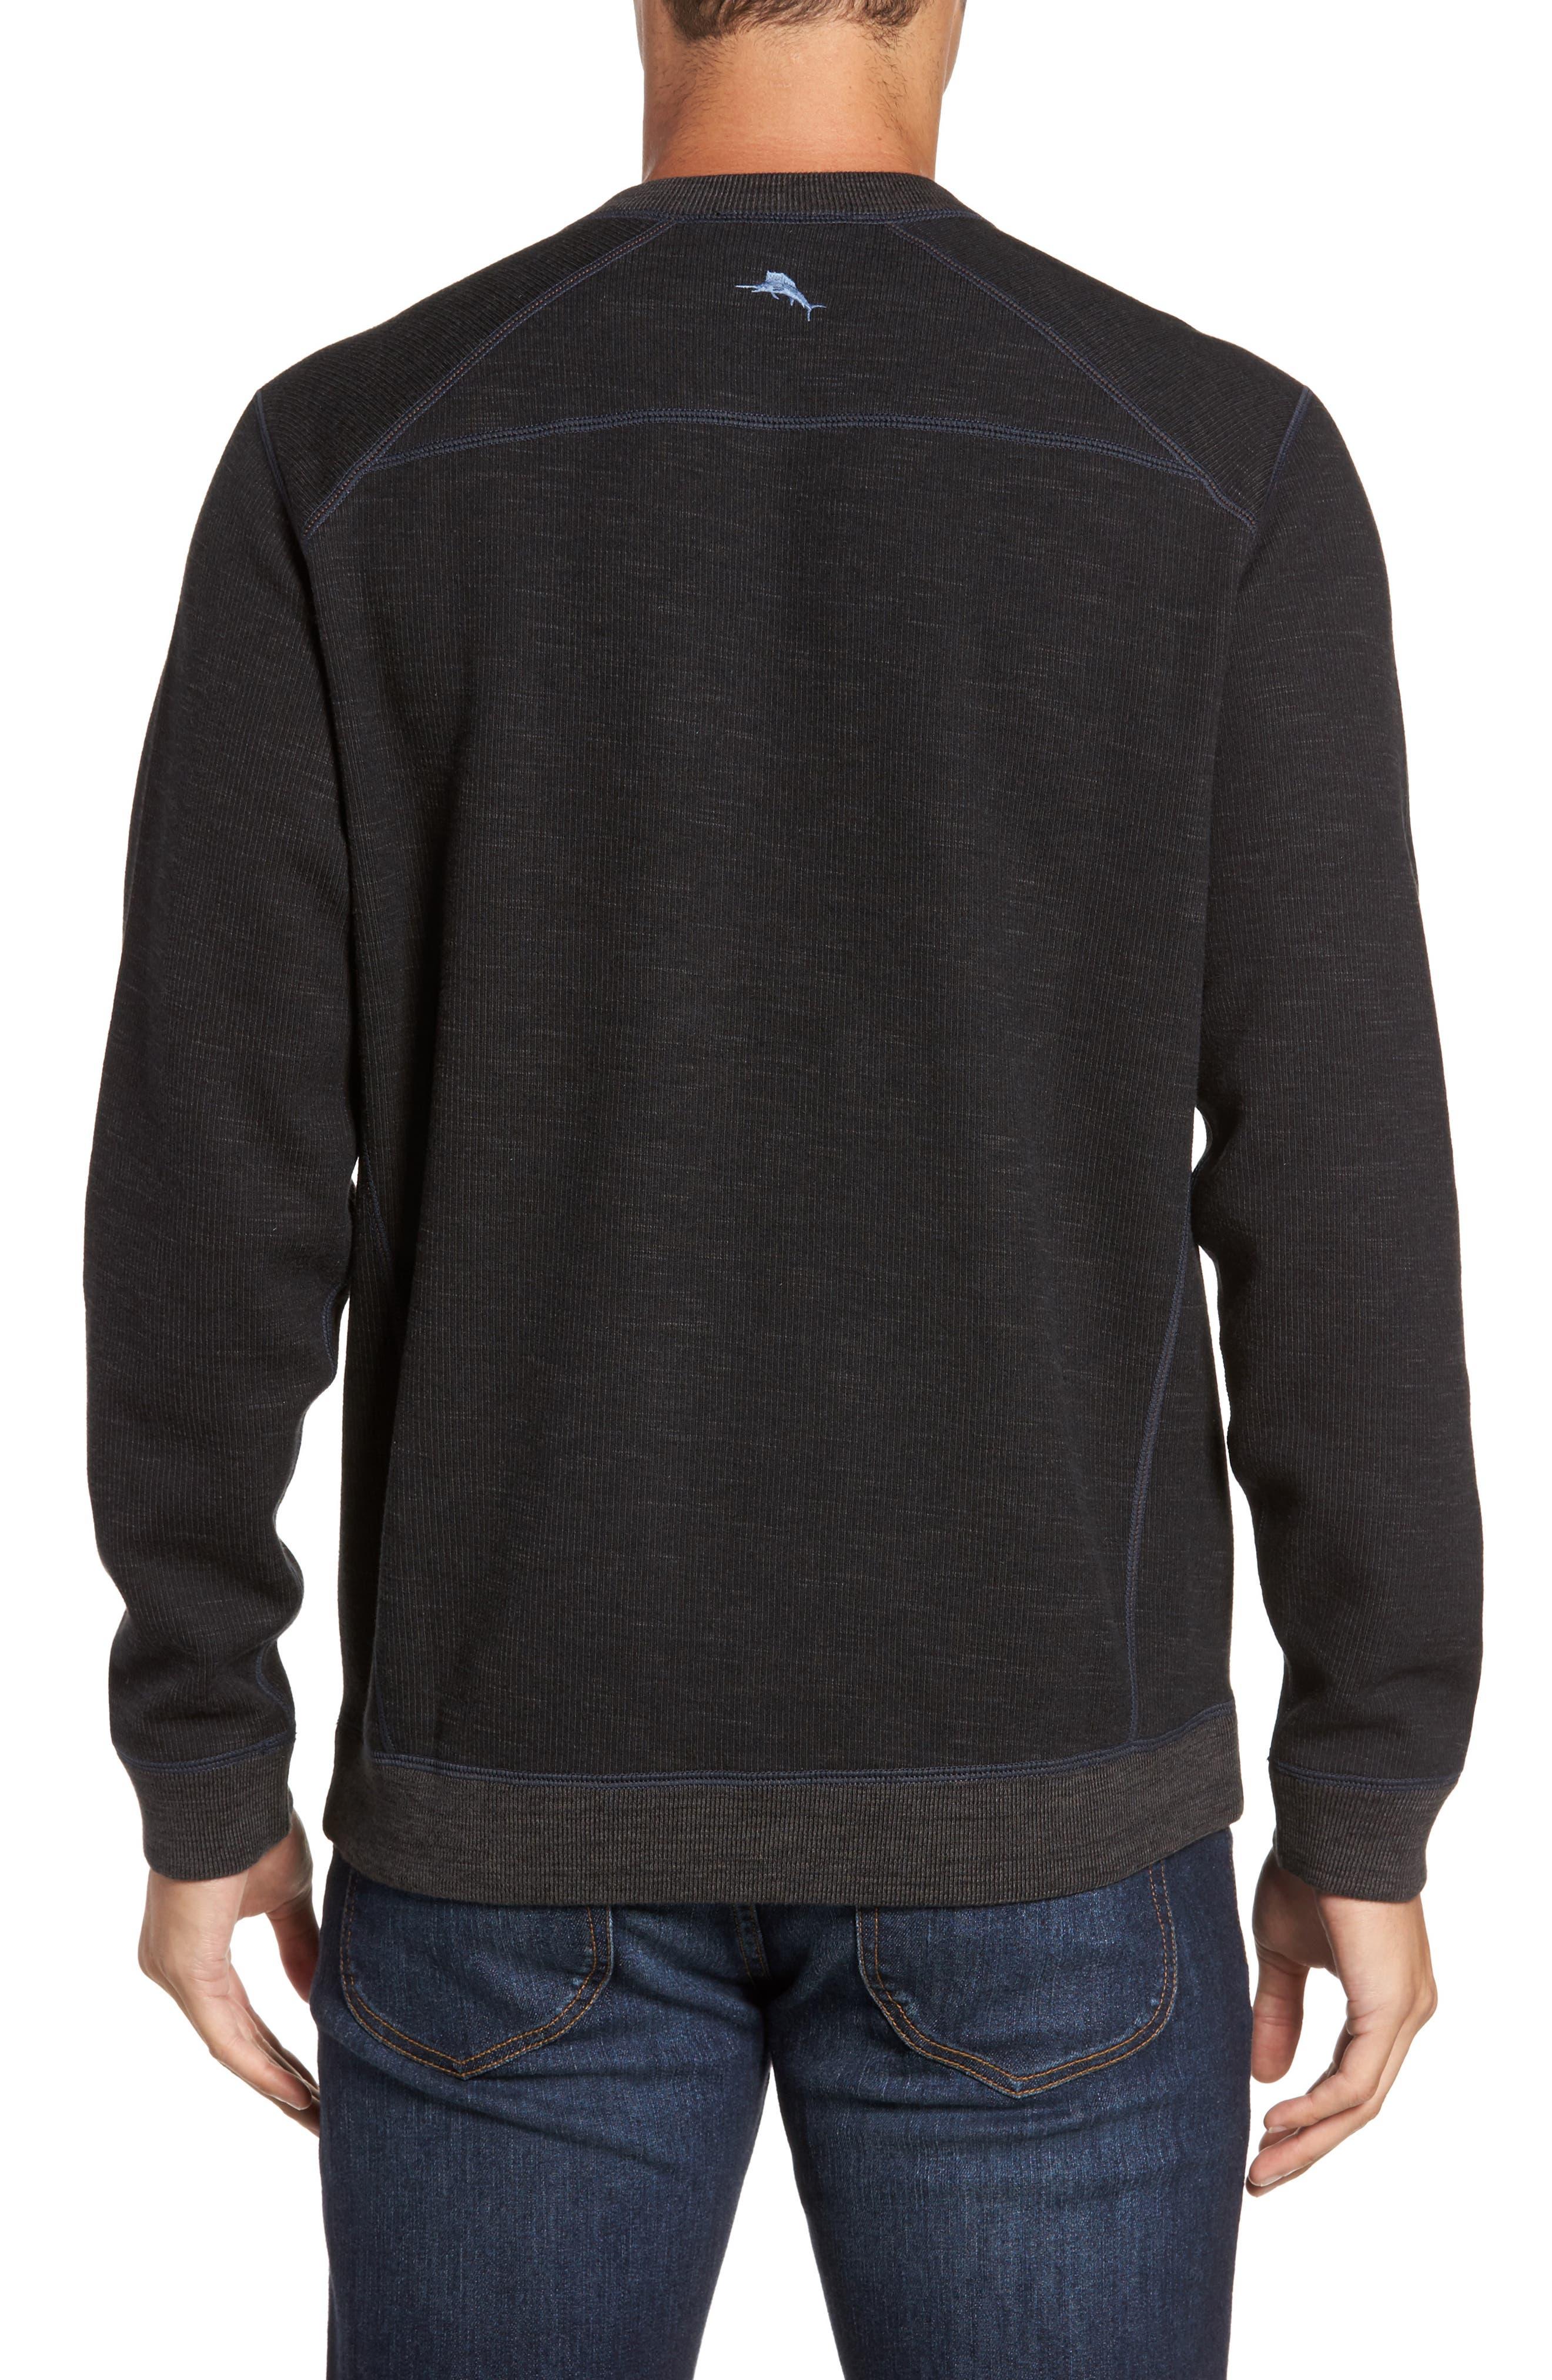 Flipside Pro Reversible Sweatshirt,                             Alternate thumbnail 2, color,                             001